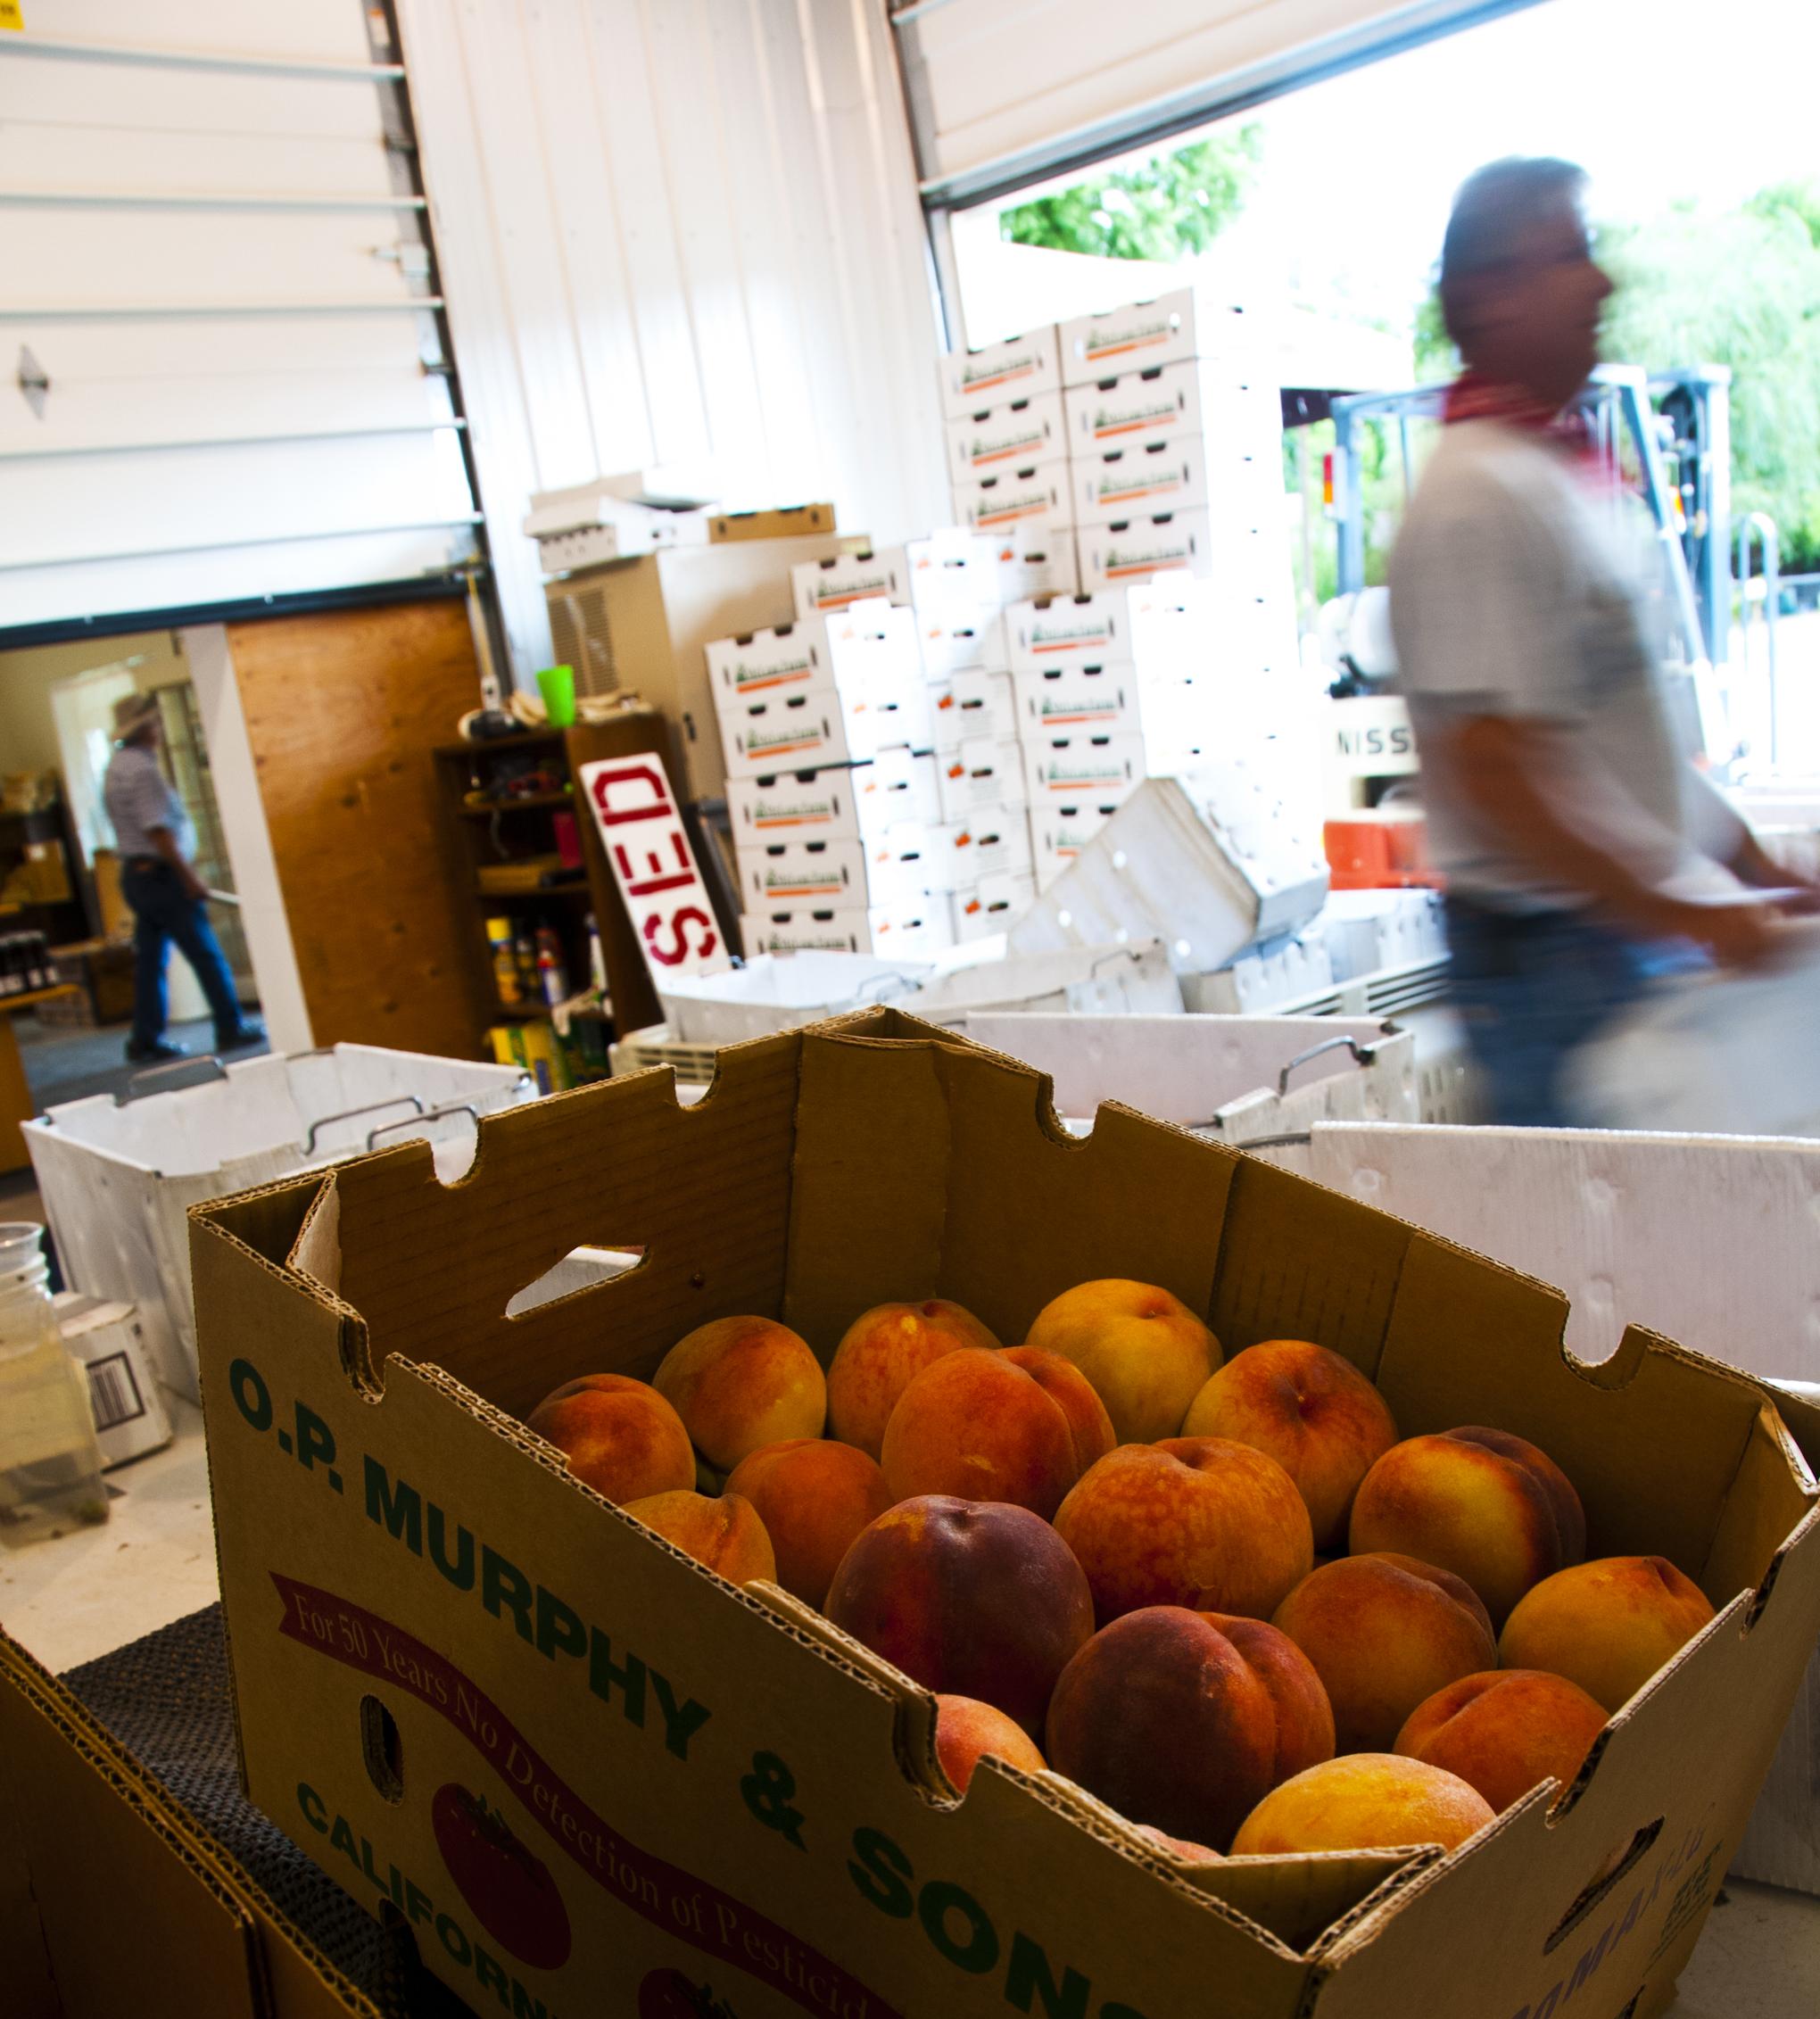 packing peaches